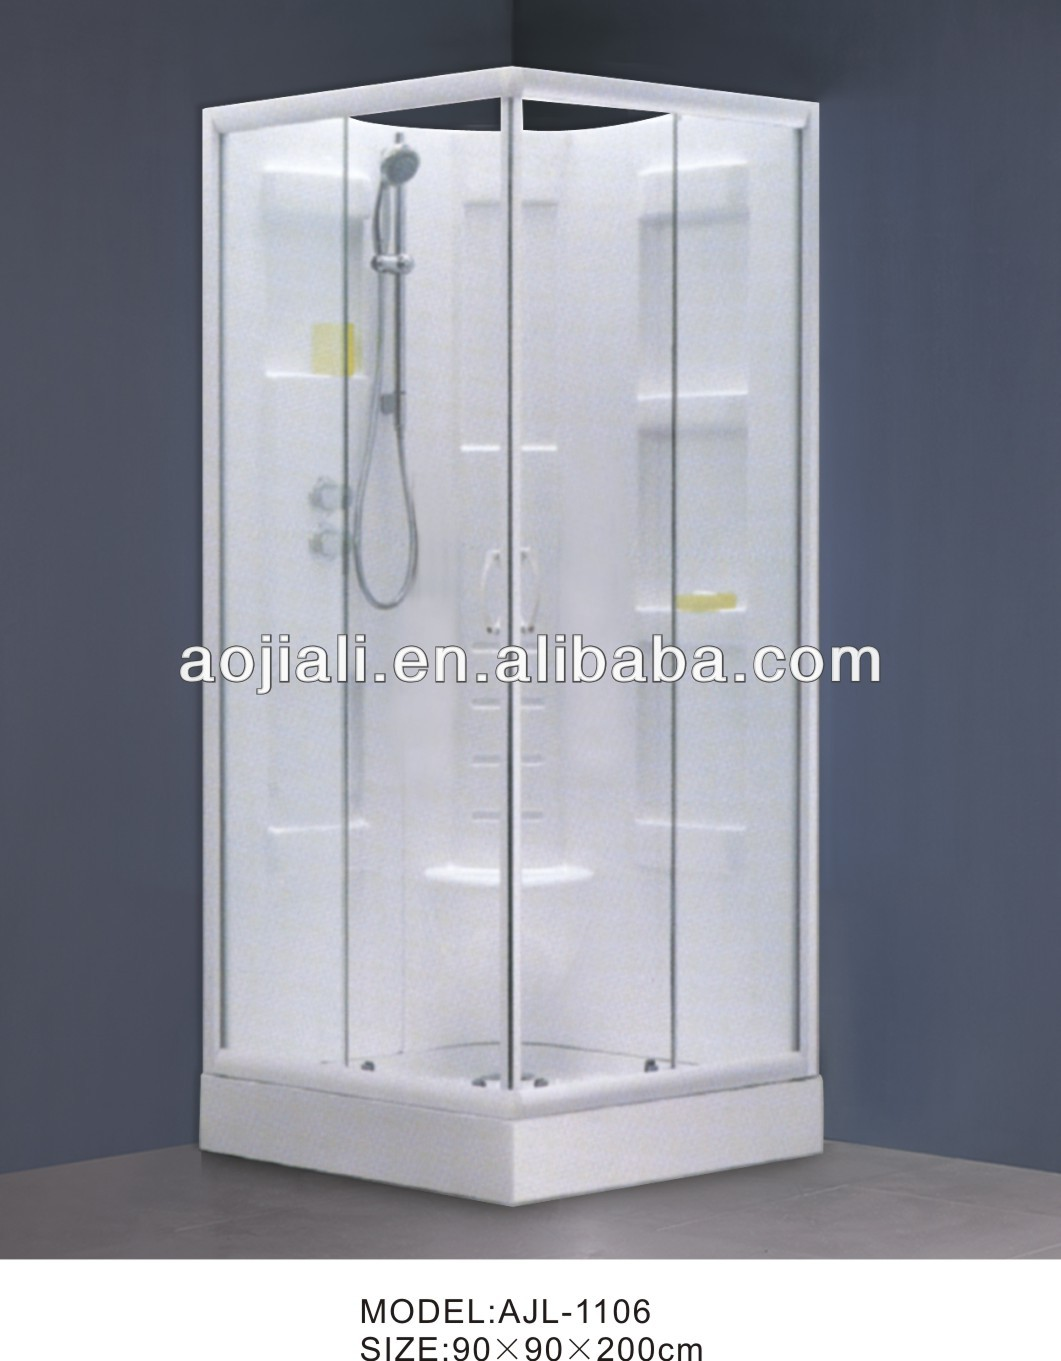 Temporary Shower Enclosures : นกเพนกวินง่ายห้องอาบน้ำฝักบัวแบบพกพาajl ตู้อาบน้ำ